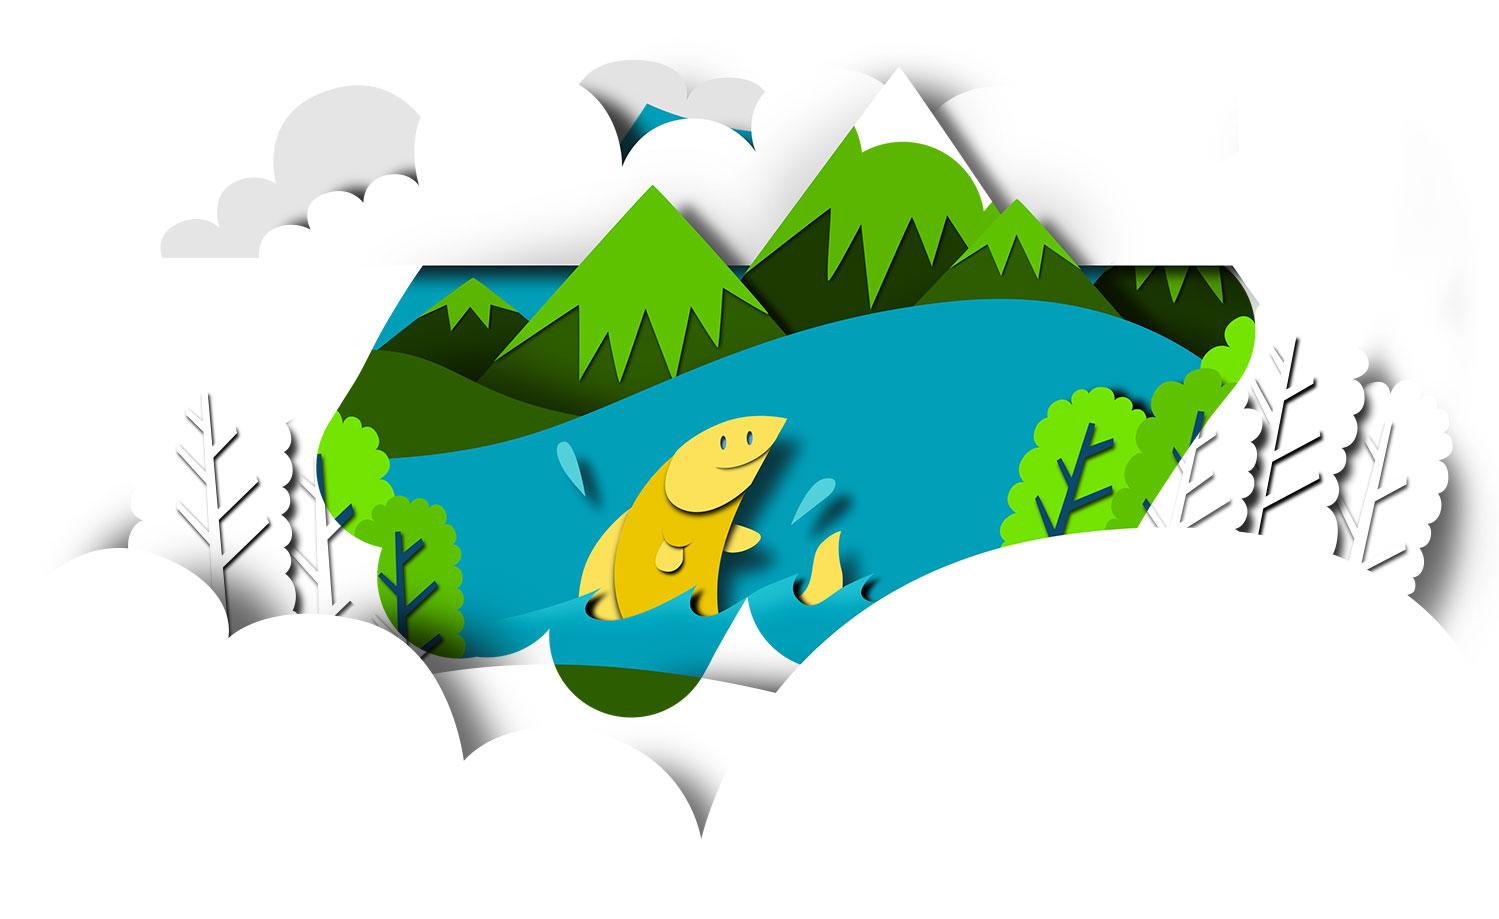 apple_papercut_illustration_cutout_summer_lake_bomboland